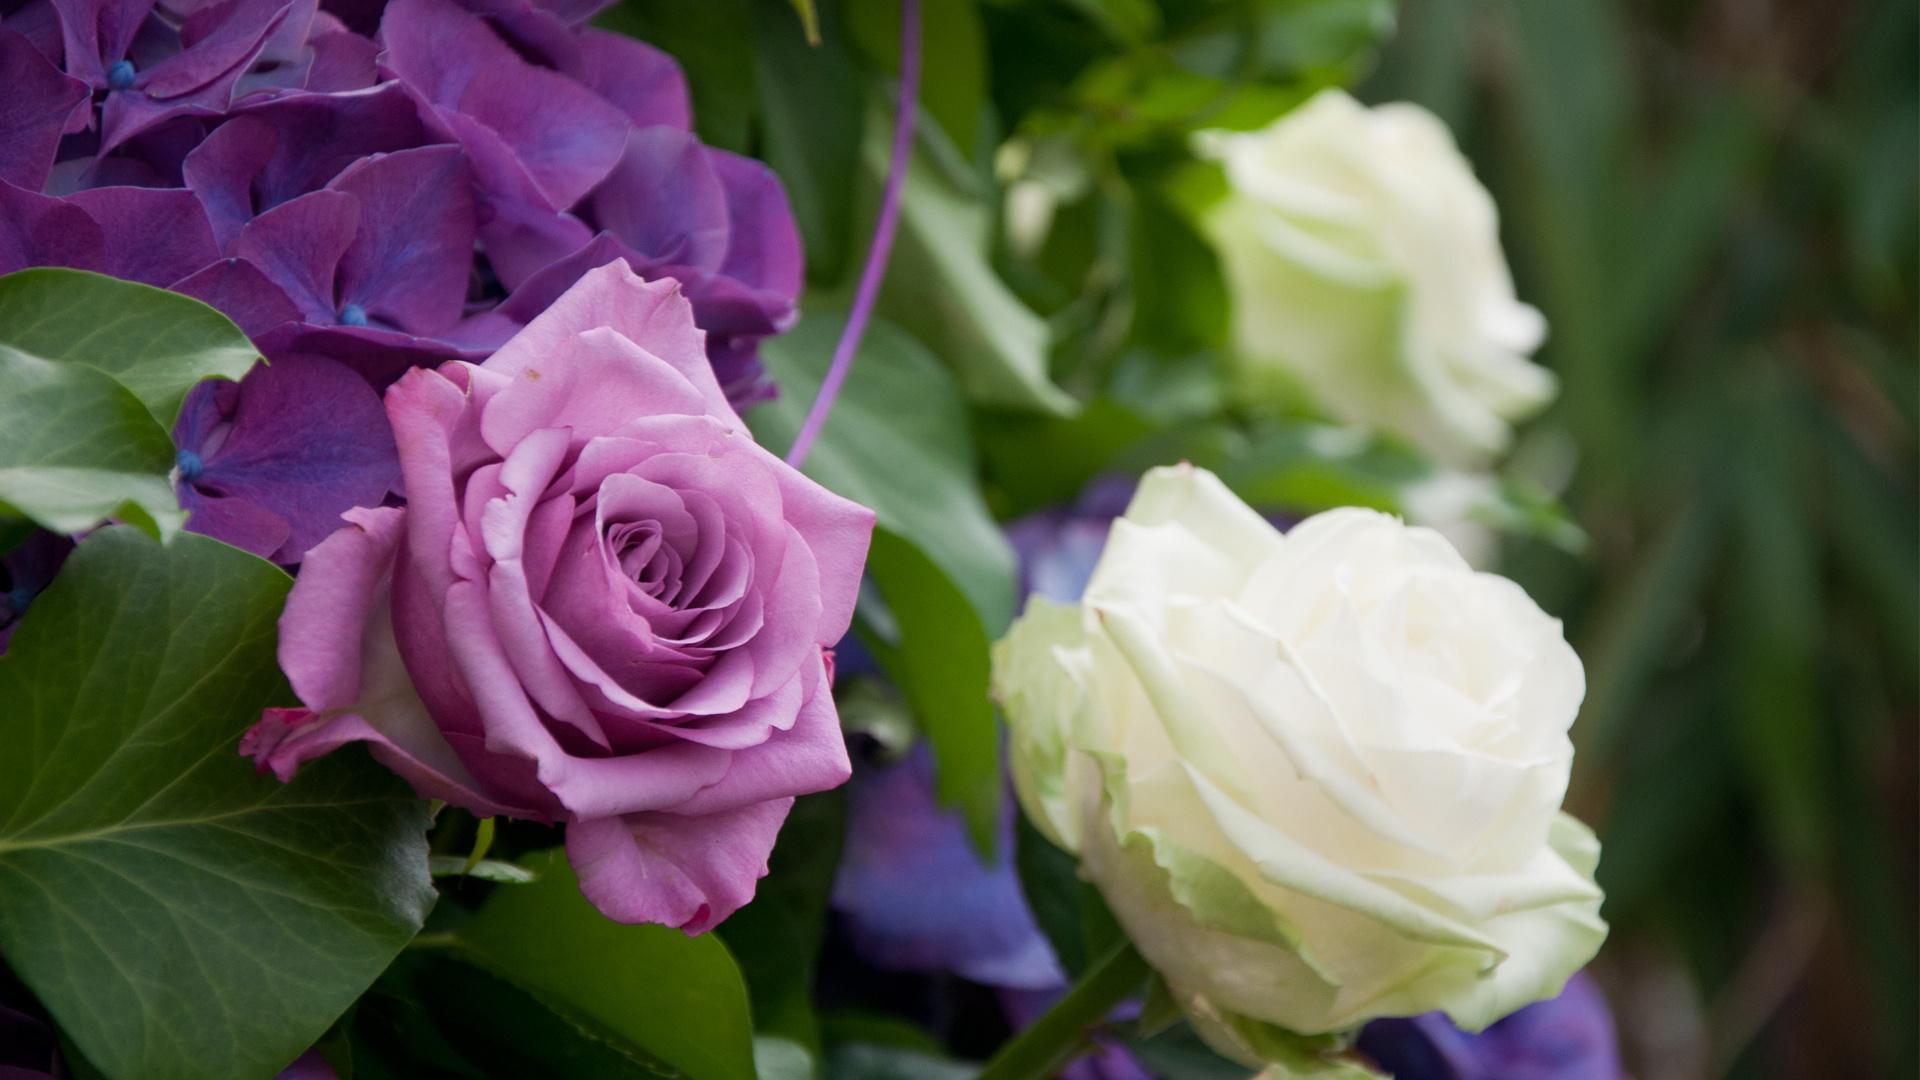 White Flowers Purple Blue Rose Blossom Hydrangea Soft Flower Plant Flora Roses Petal Land Flowering